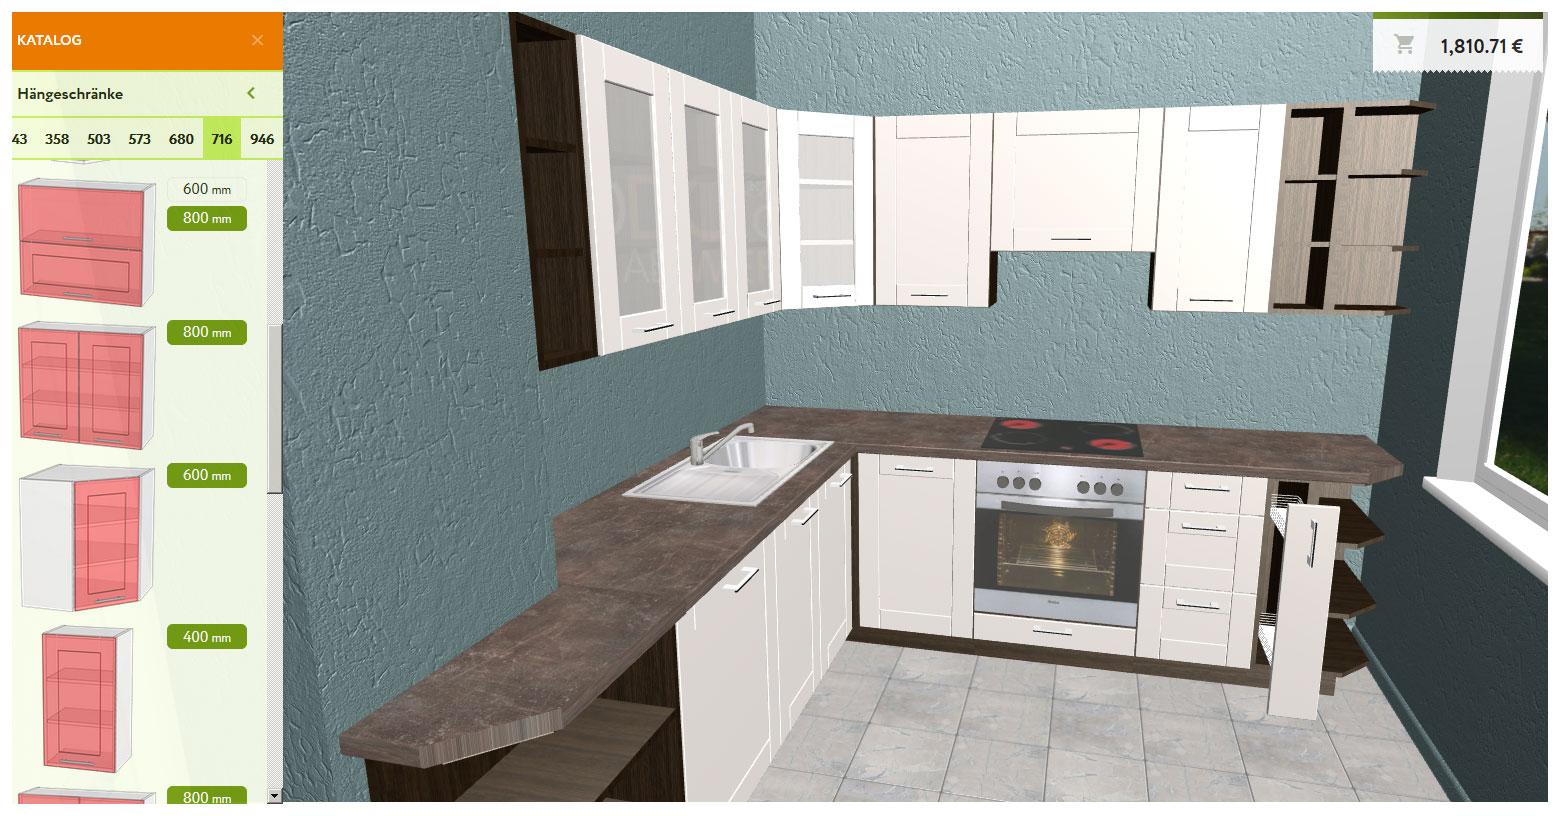 Full Size of Küche Selber Planen Programm Küche Selber Planen Online Wie Kann Ich Meine Küche Selber Planen Küche Selber Planen Und Bestellen Küche Küche Selber Planen